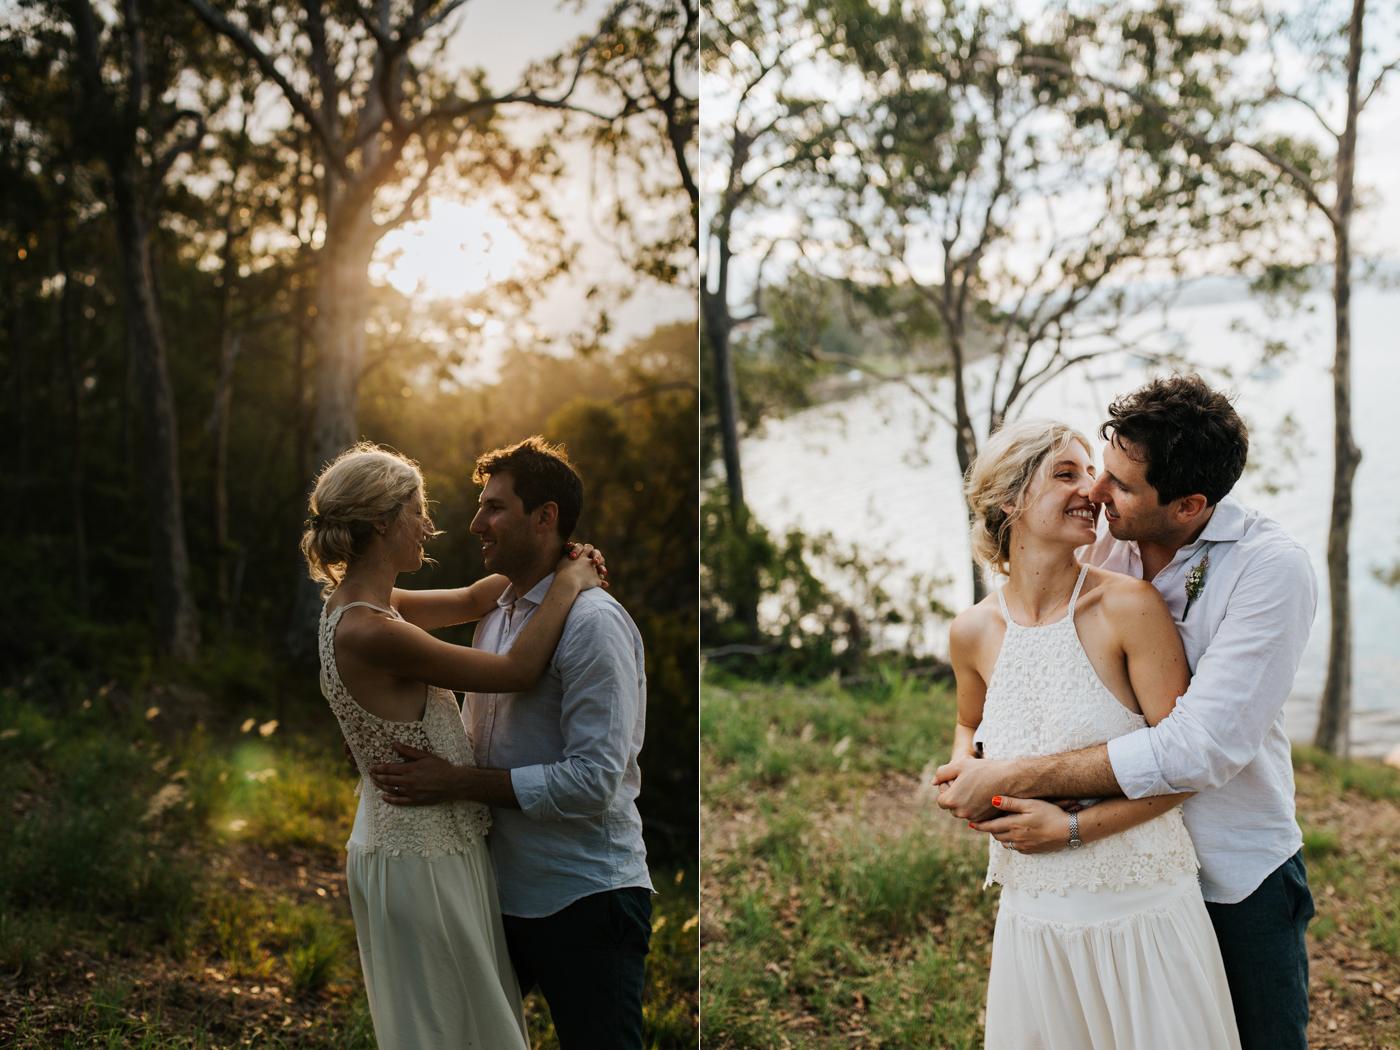 Emma & Ben - Lake Macquarie - Hunter Valley Wedding - Samantha Heather Photography-217.jpg